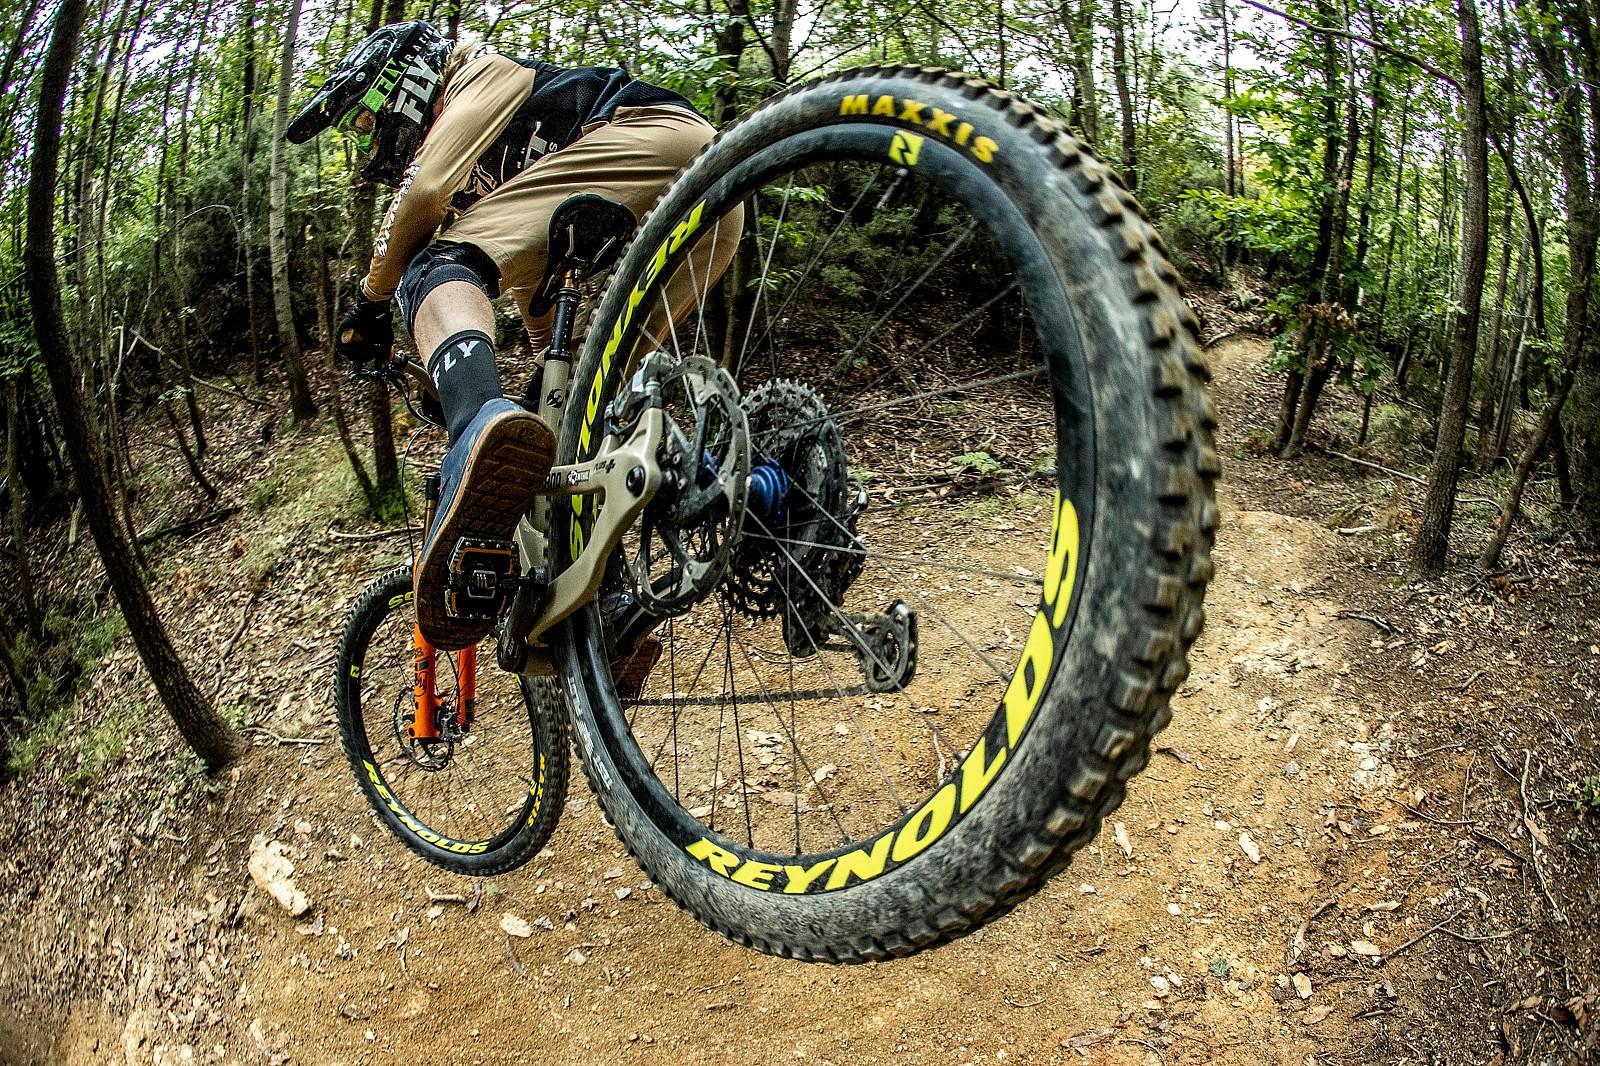 PHOTO BLAST - Enduro World Series Finale Shakedown - Photo Blast - Enduro World Series Shakedown - Mountain Biking Pictures - Vital MTB